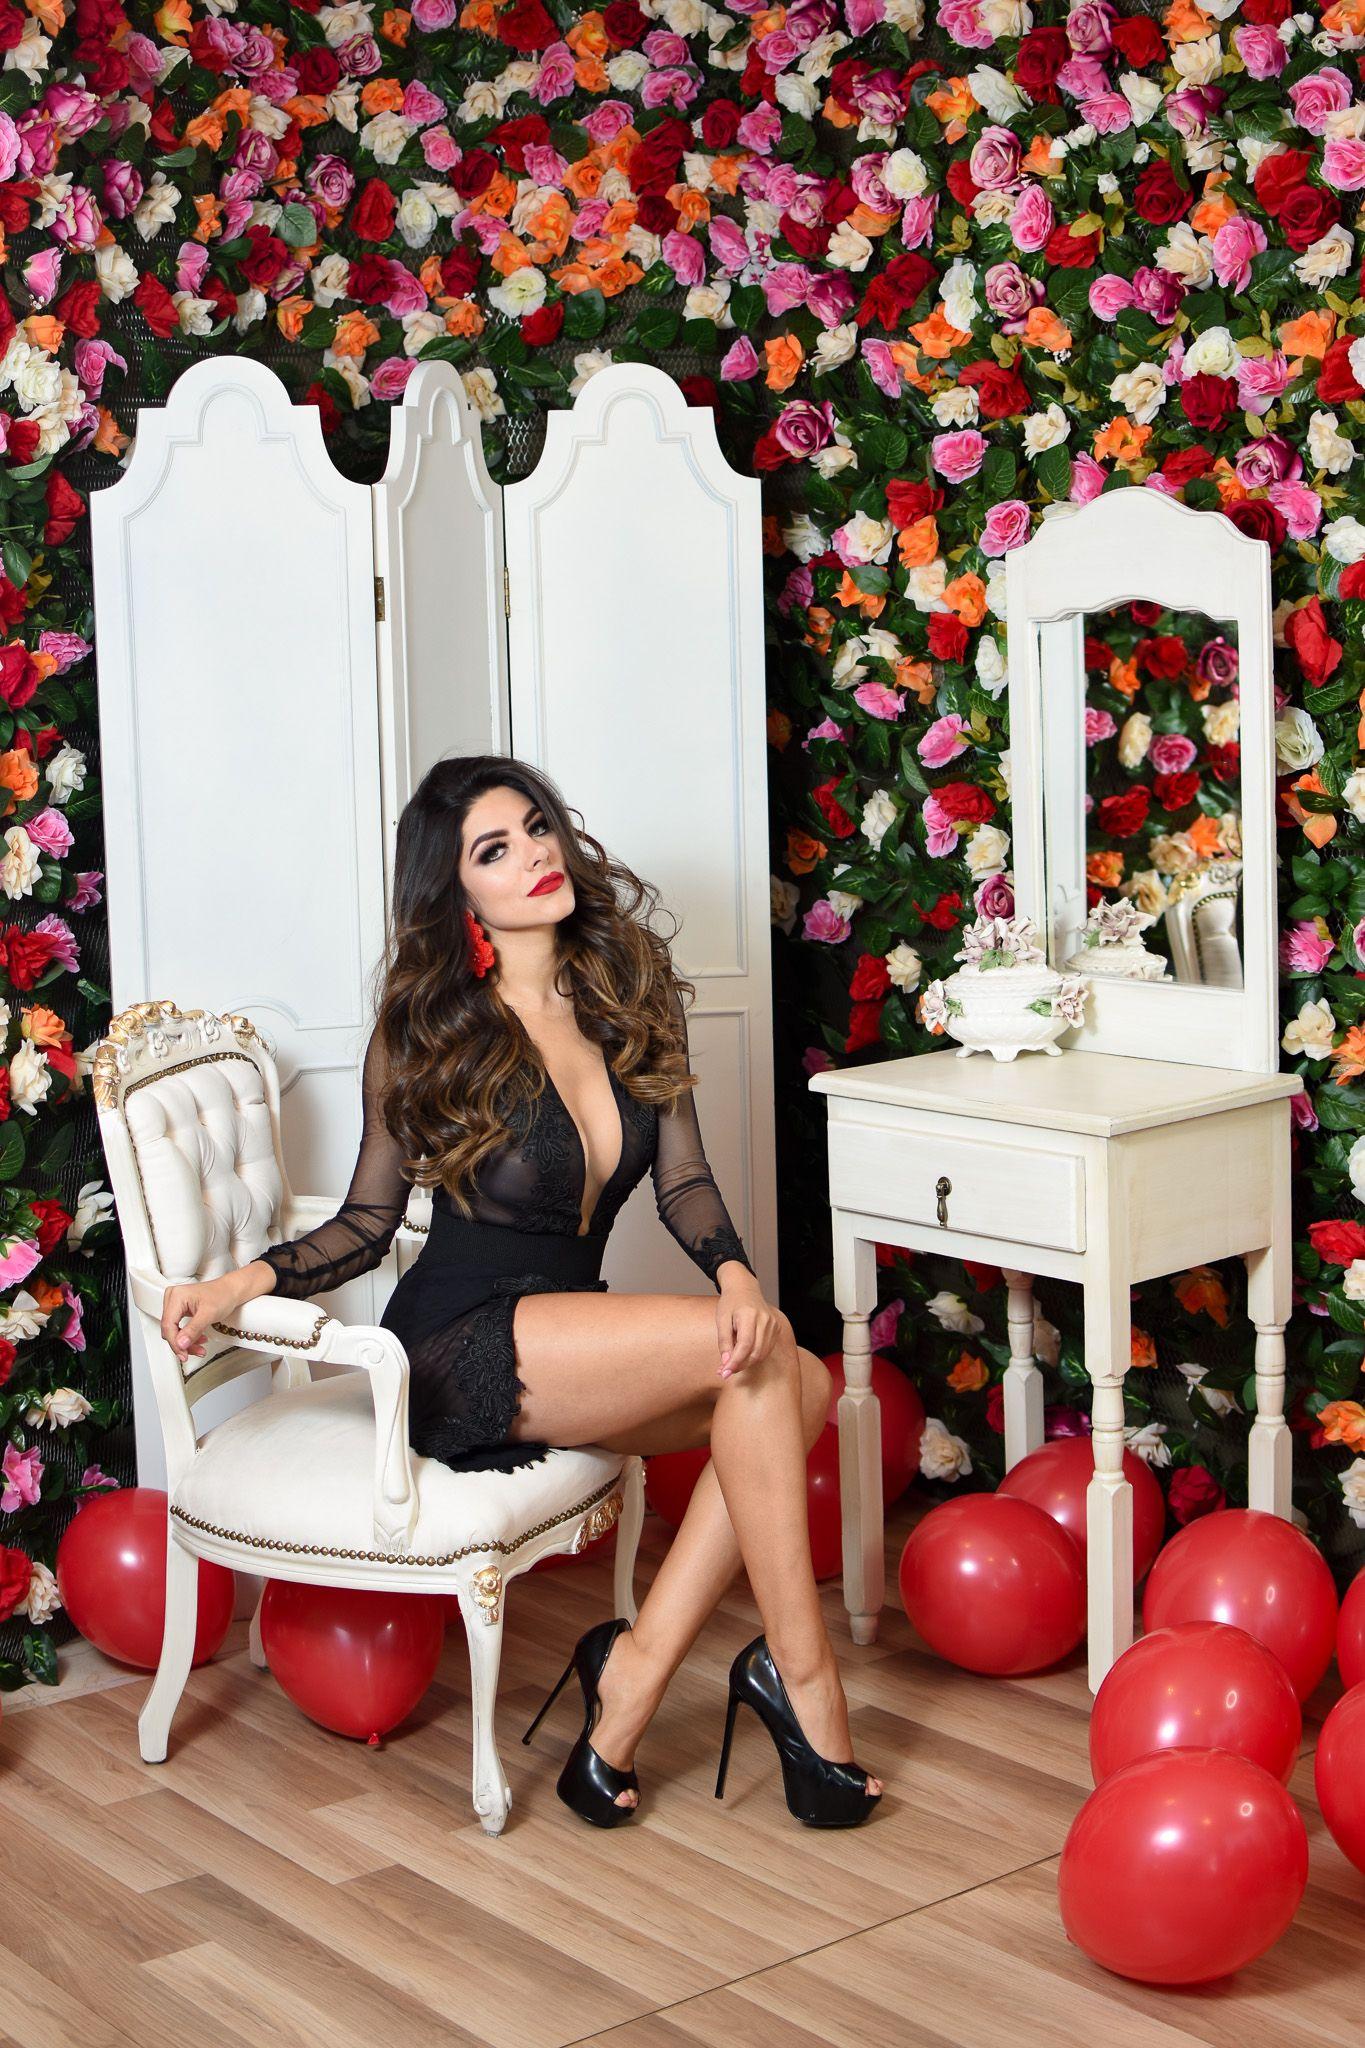 Flor De Azahar Fotografías e imágenes de stock - Getty Images